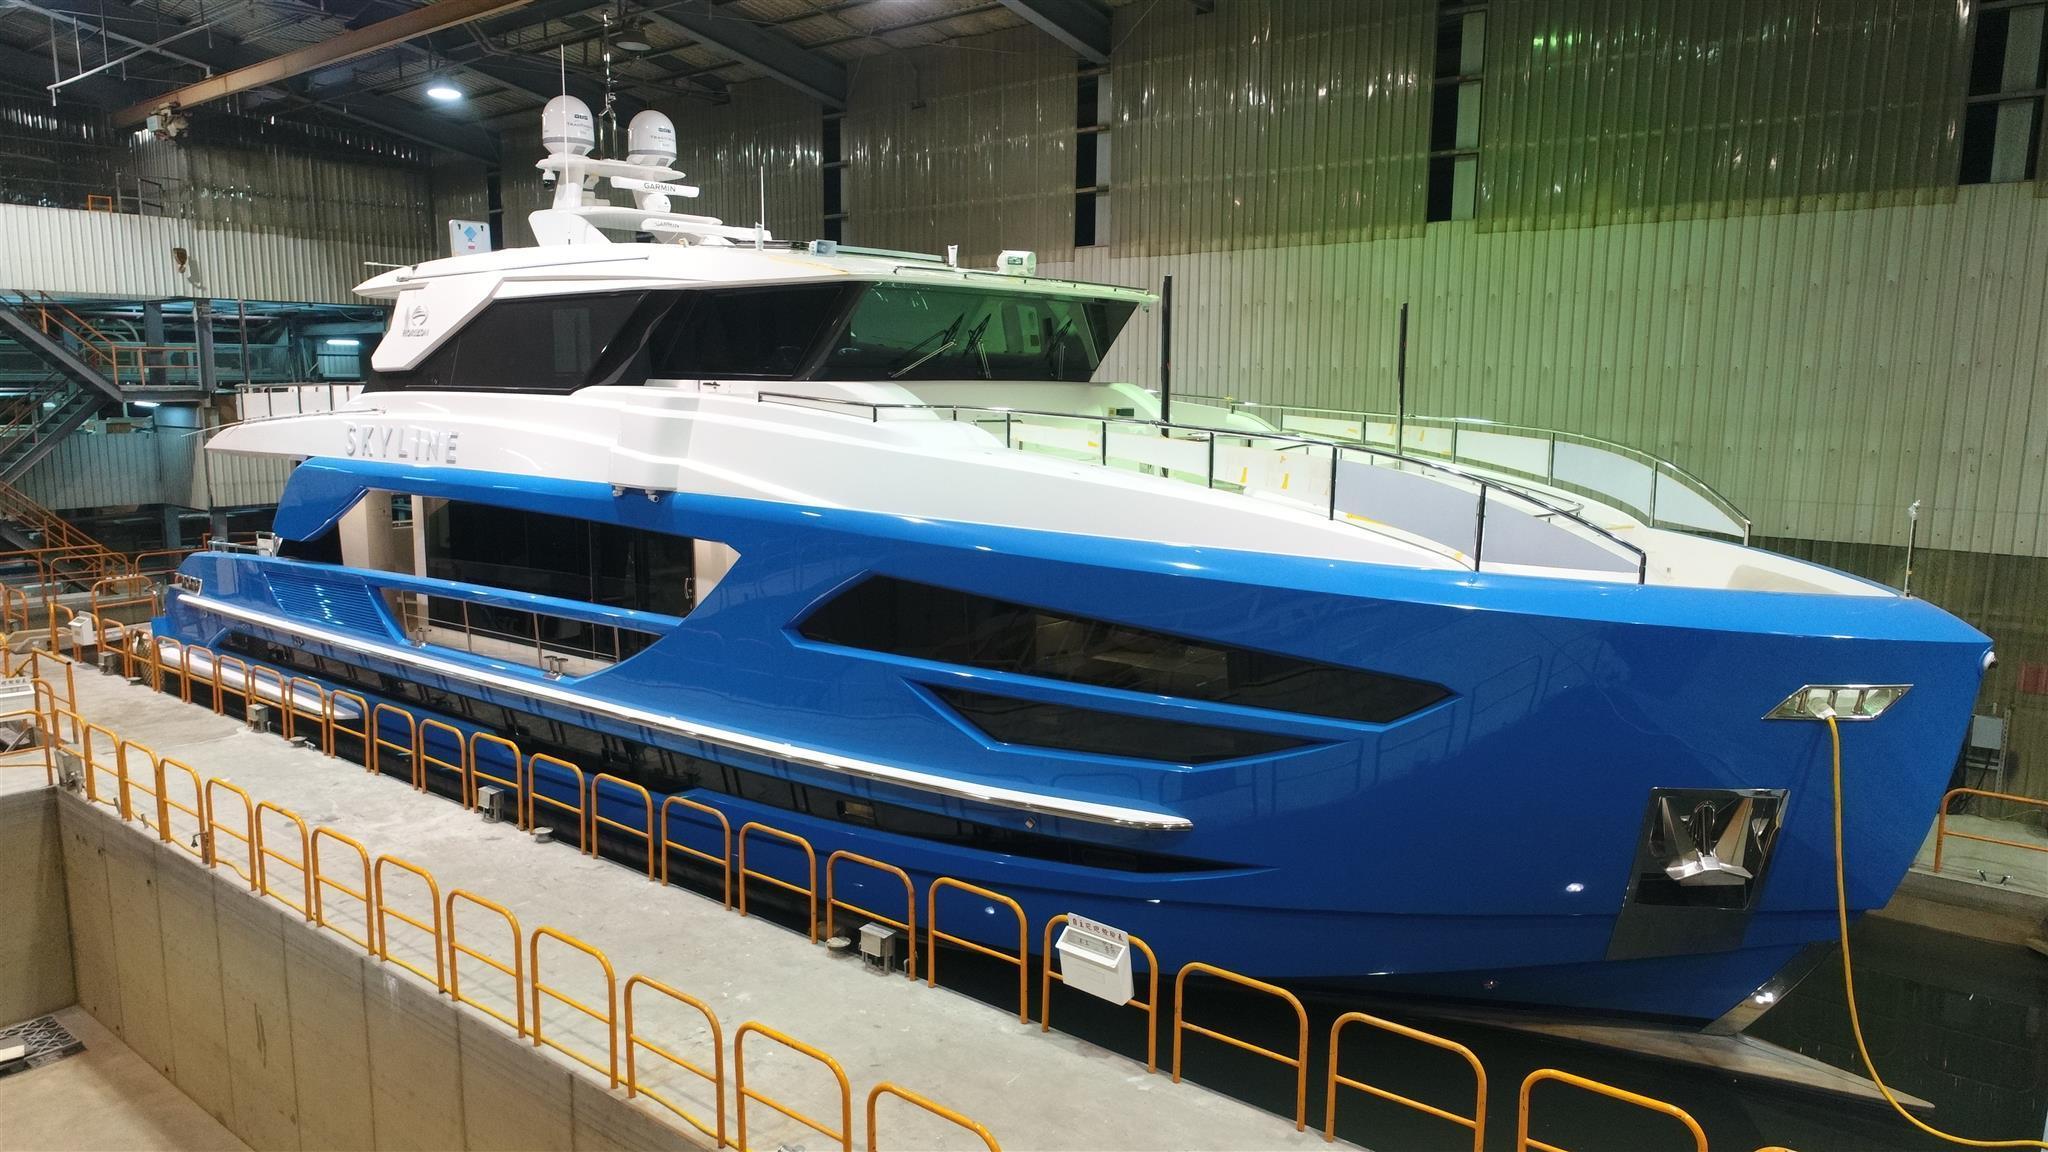 fd 87 skyline motoryacht horizon 2018 26m pre launch trials